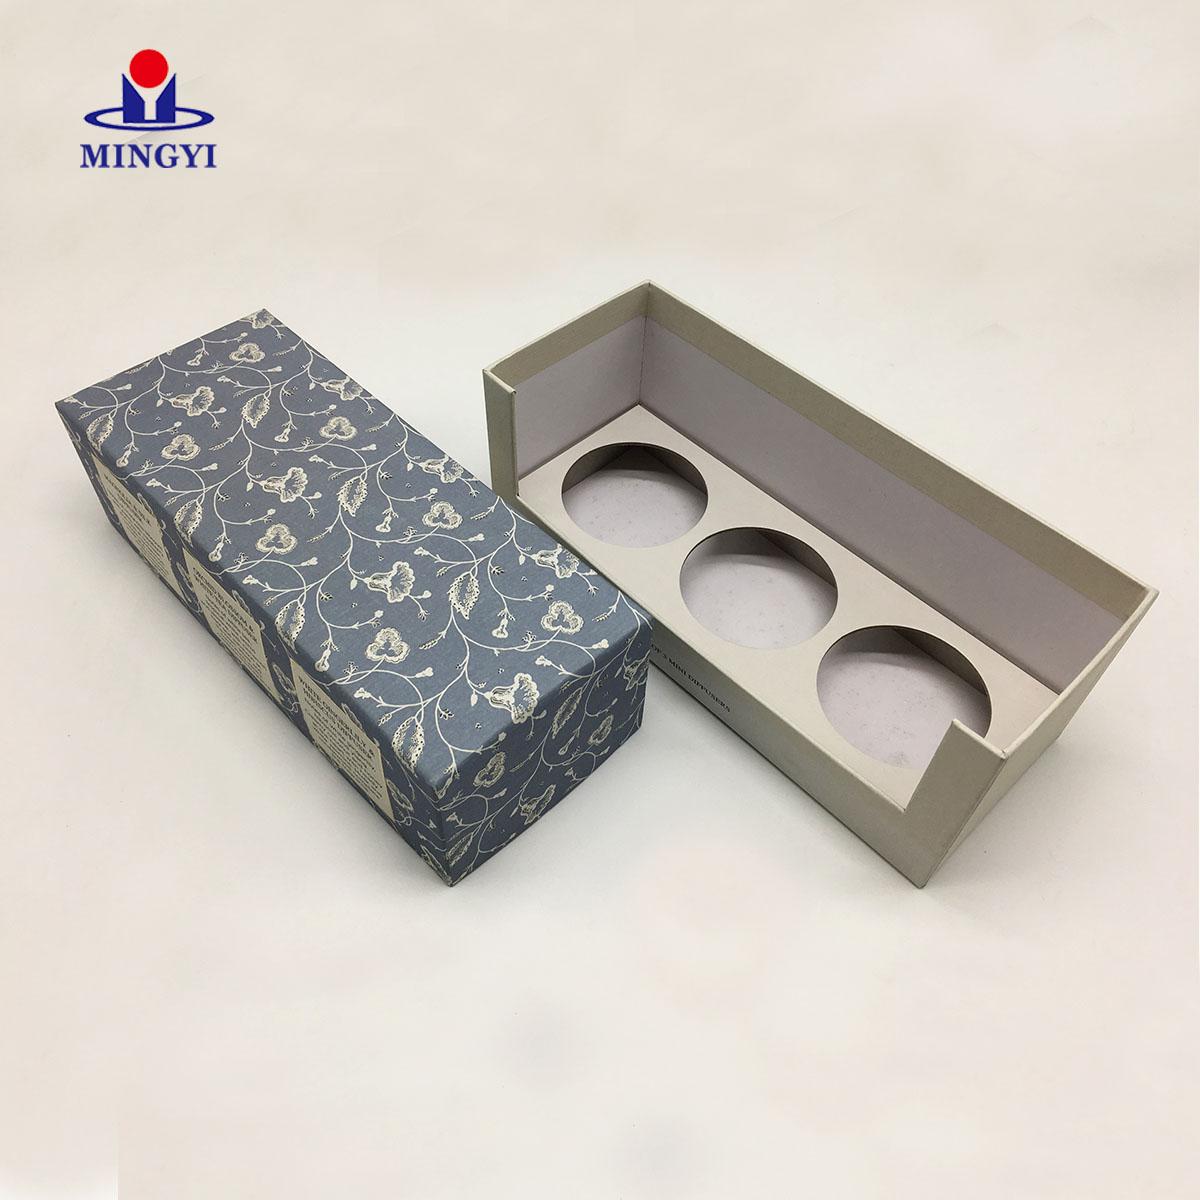 Mingyi Printing Luxury cosmetic packaging gift box Cardboard Gift Box image4